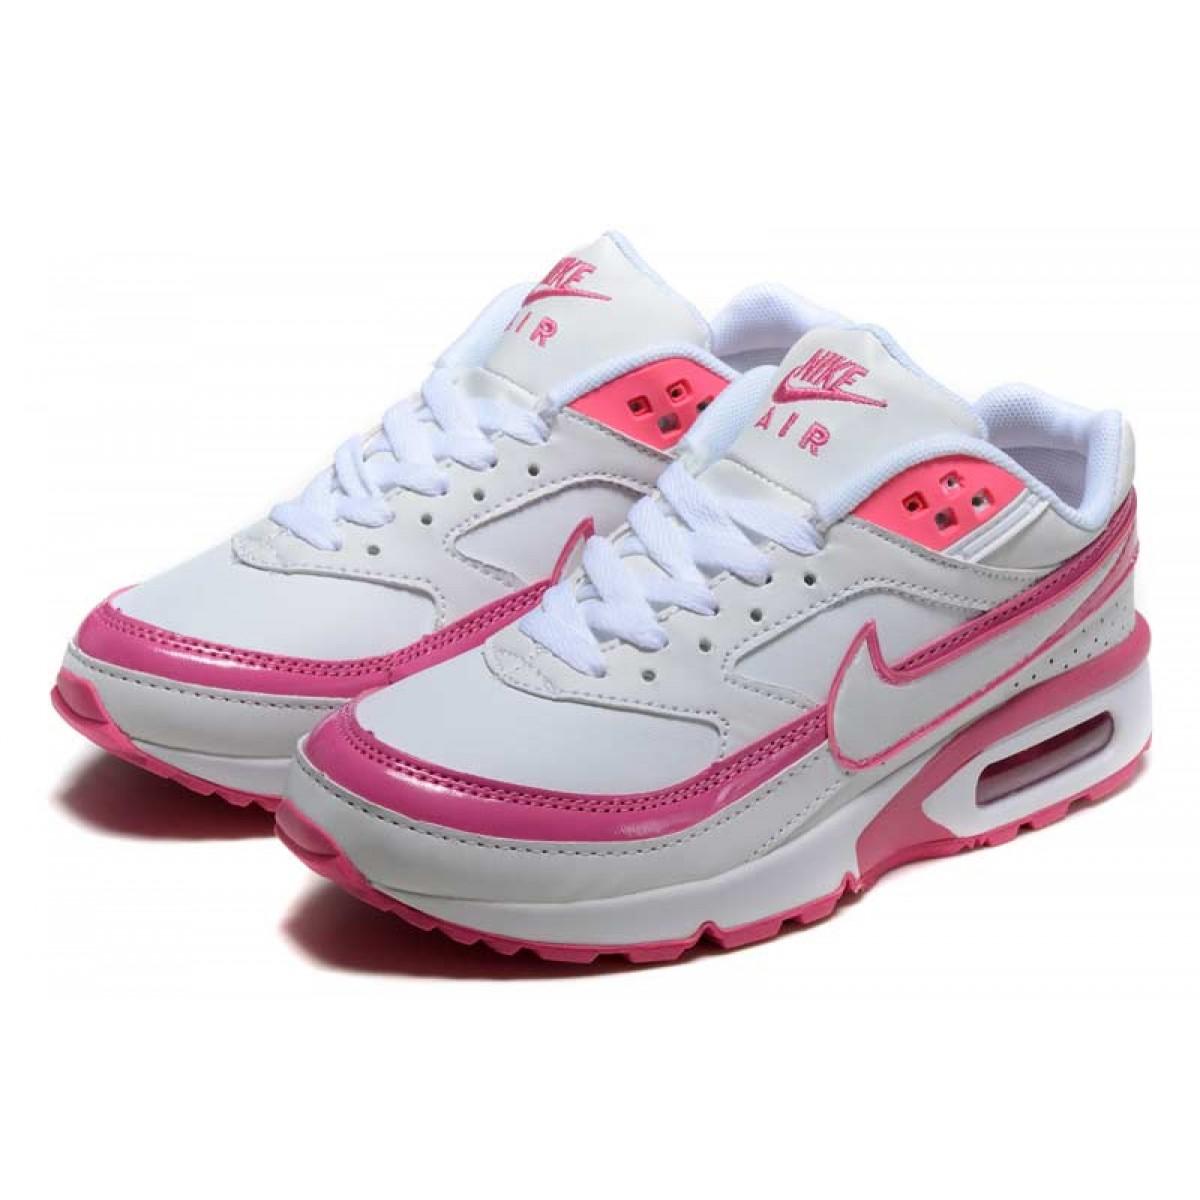 air max classic femme blanc rose